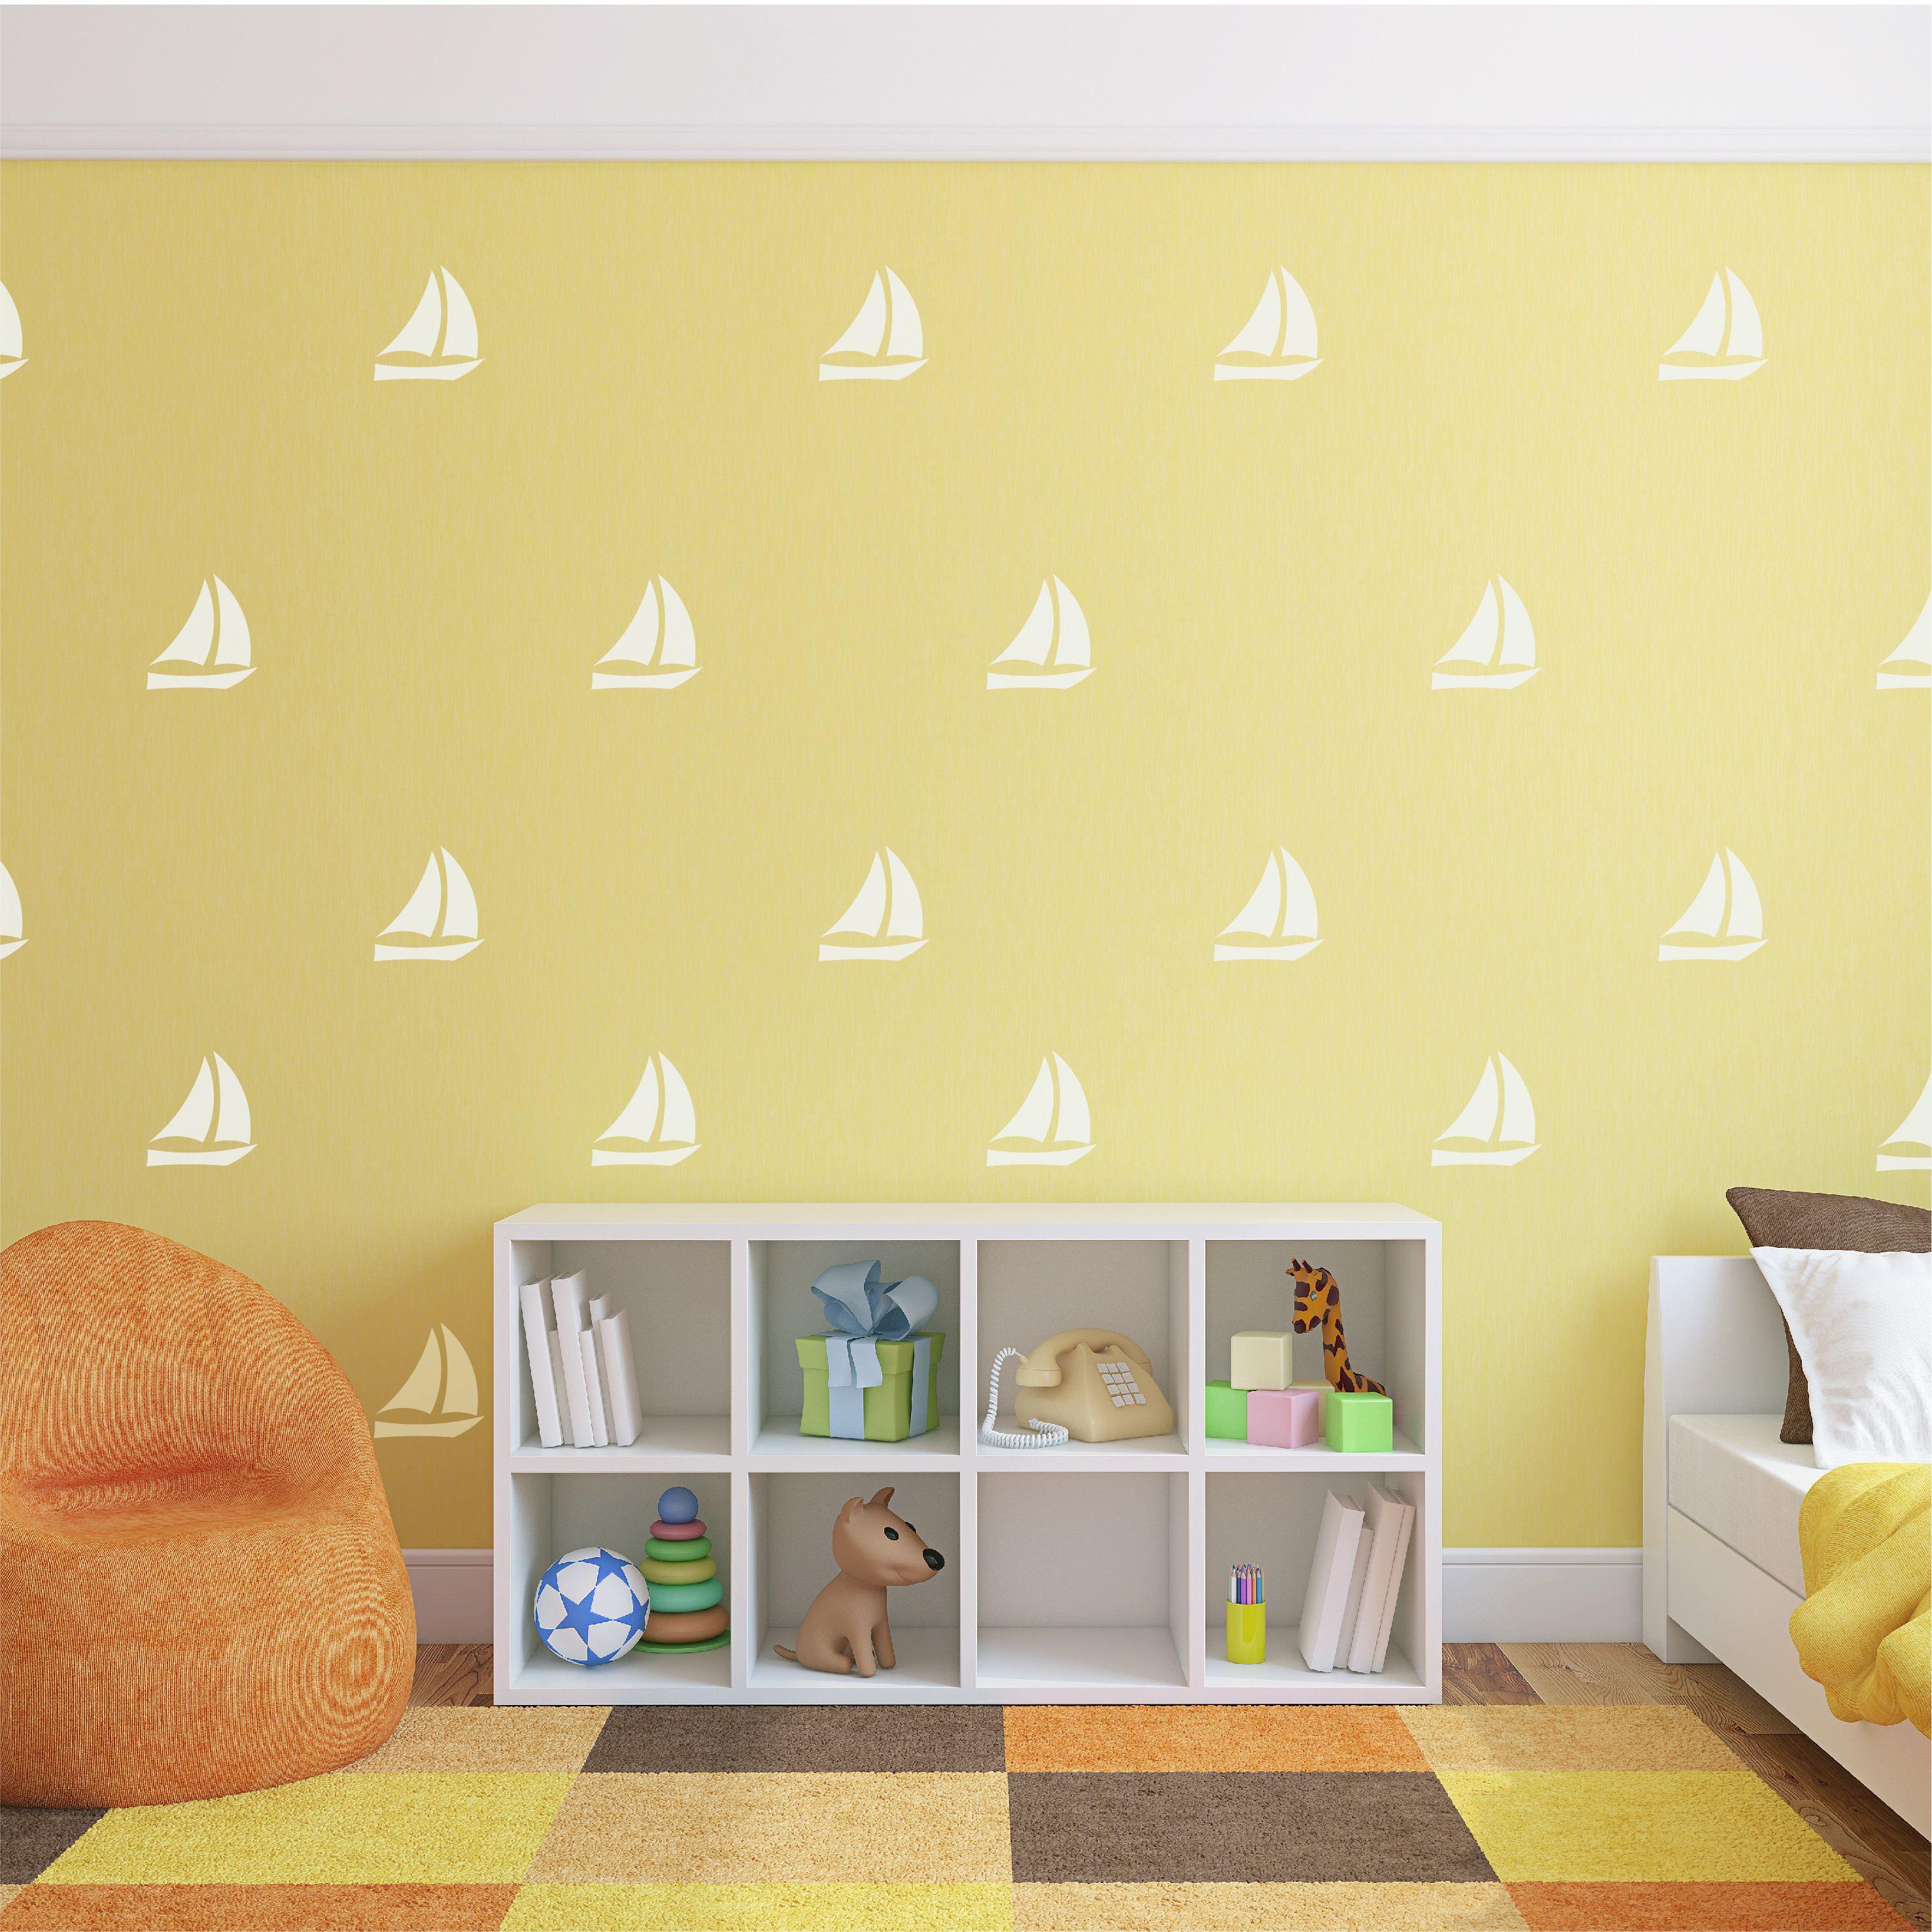 Charming Nautical Wall Art For Nursery Gallery - The Wall Art ...